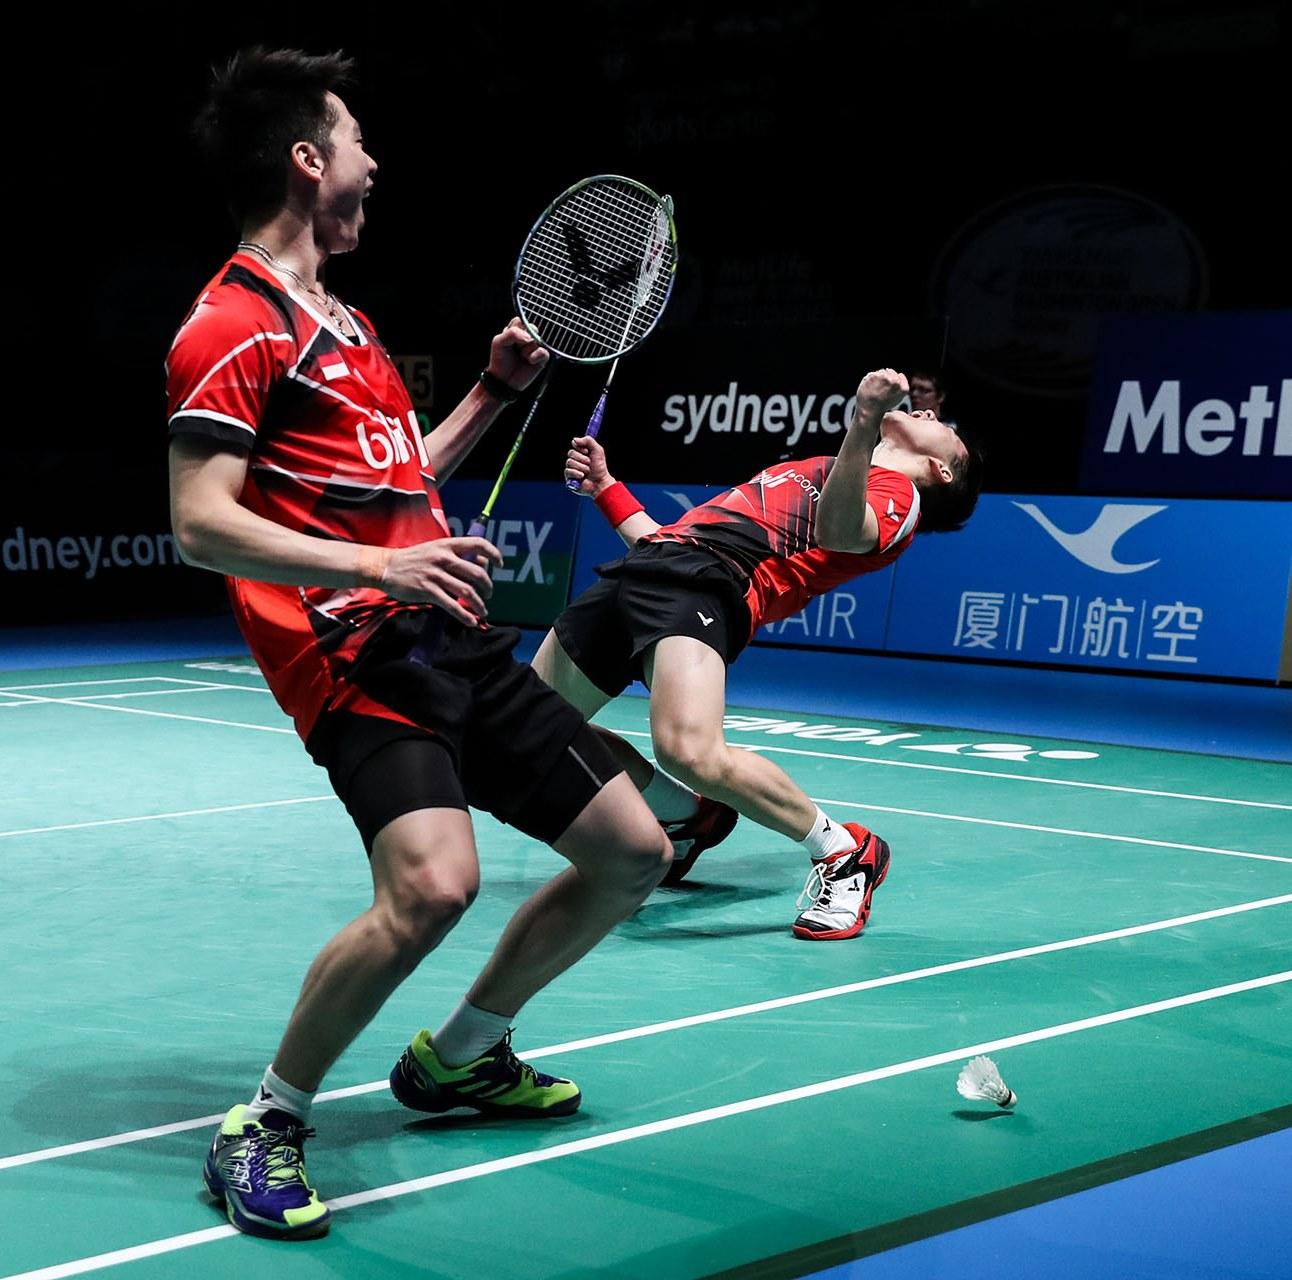 Australian Open 2016 - Day 6 - Marcus Fernaldi Gideon & Kevin Sanjaya Sukamuljo of Indonesia